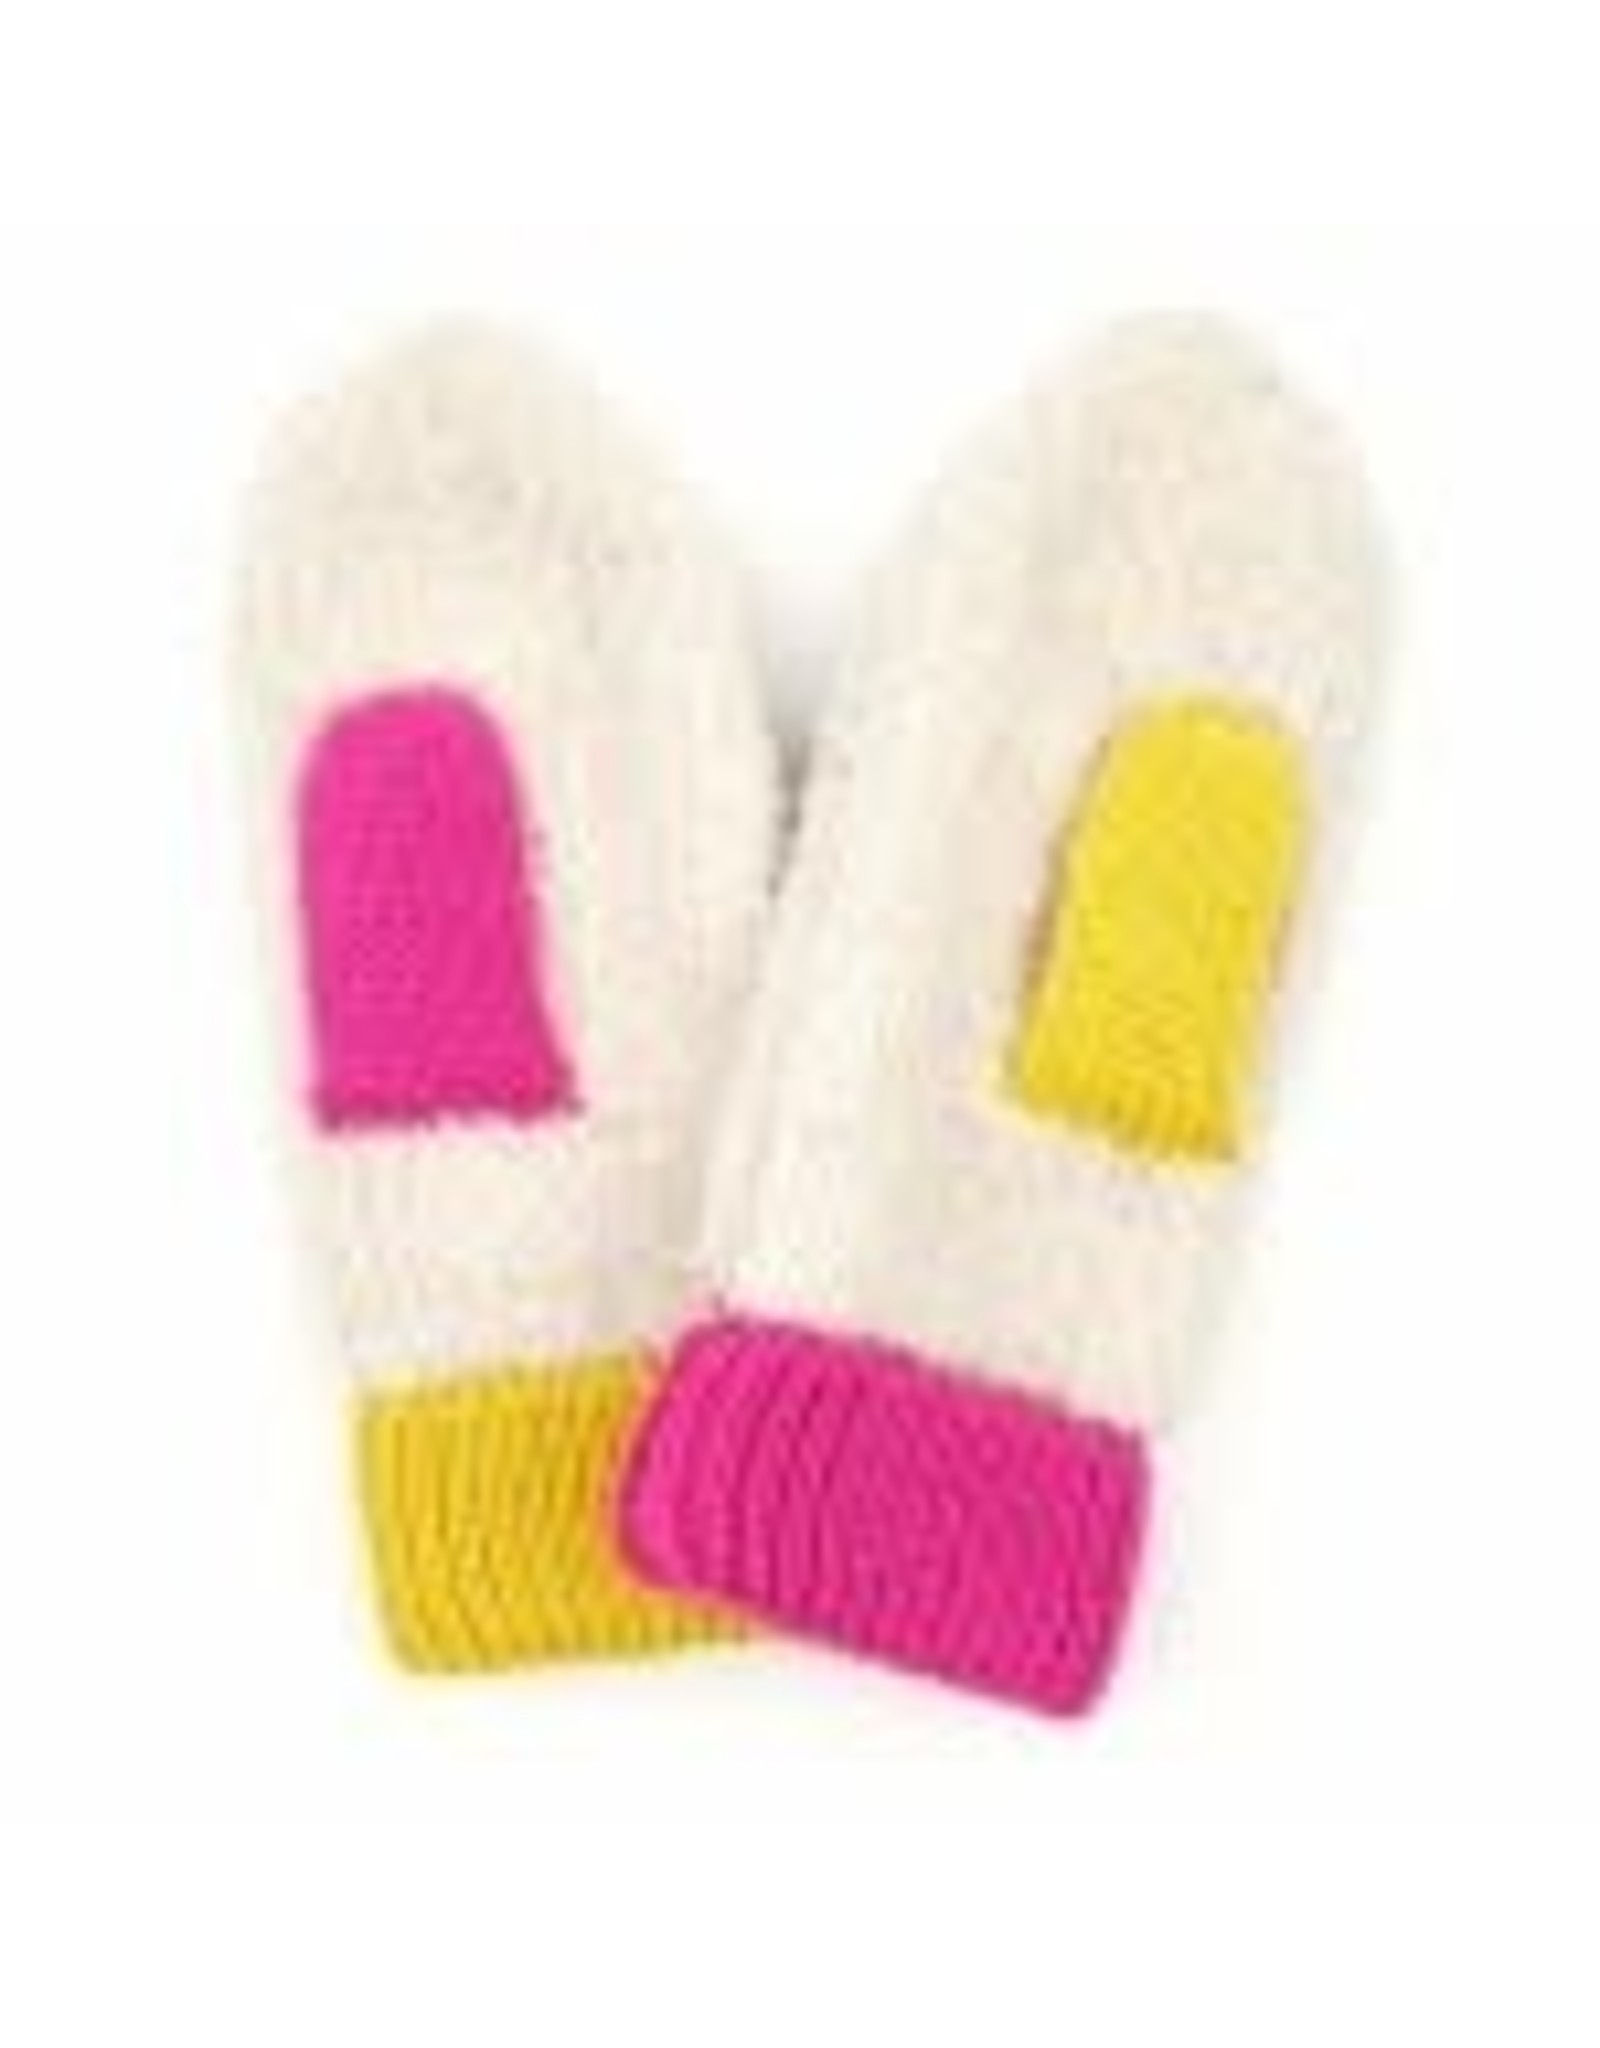 CC Cream/Pink/Yellow Mittens